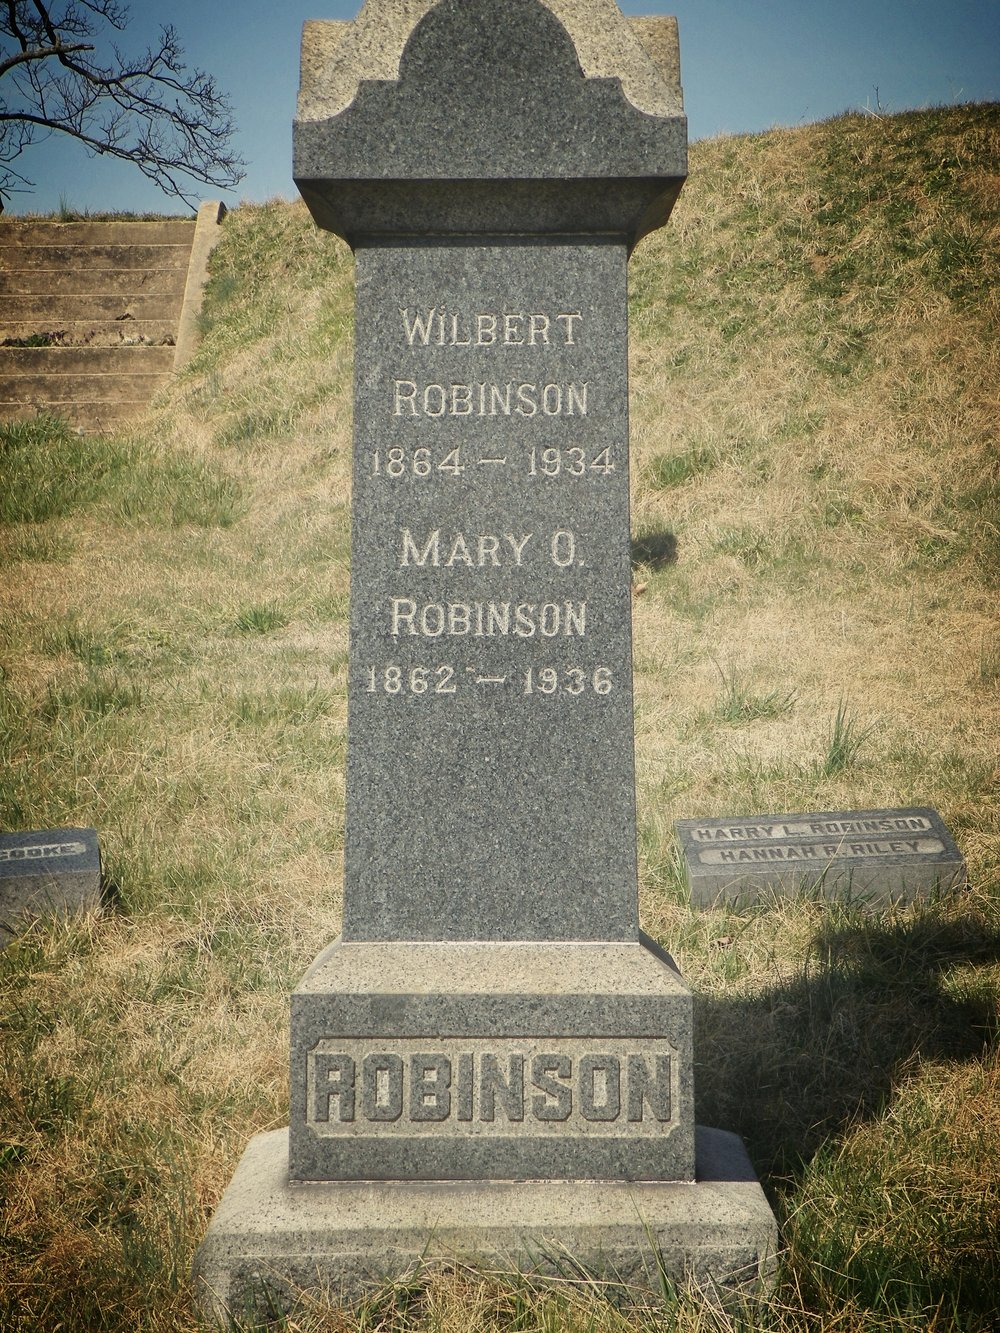 Wilbert Robinson